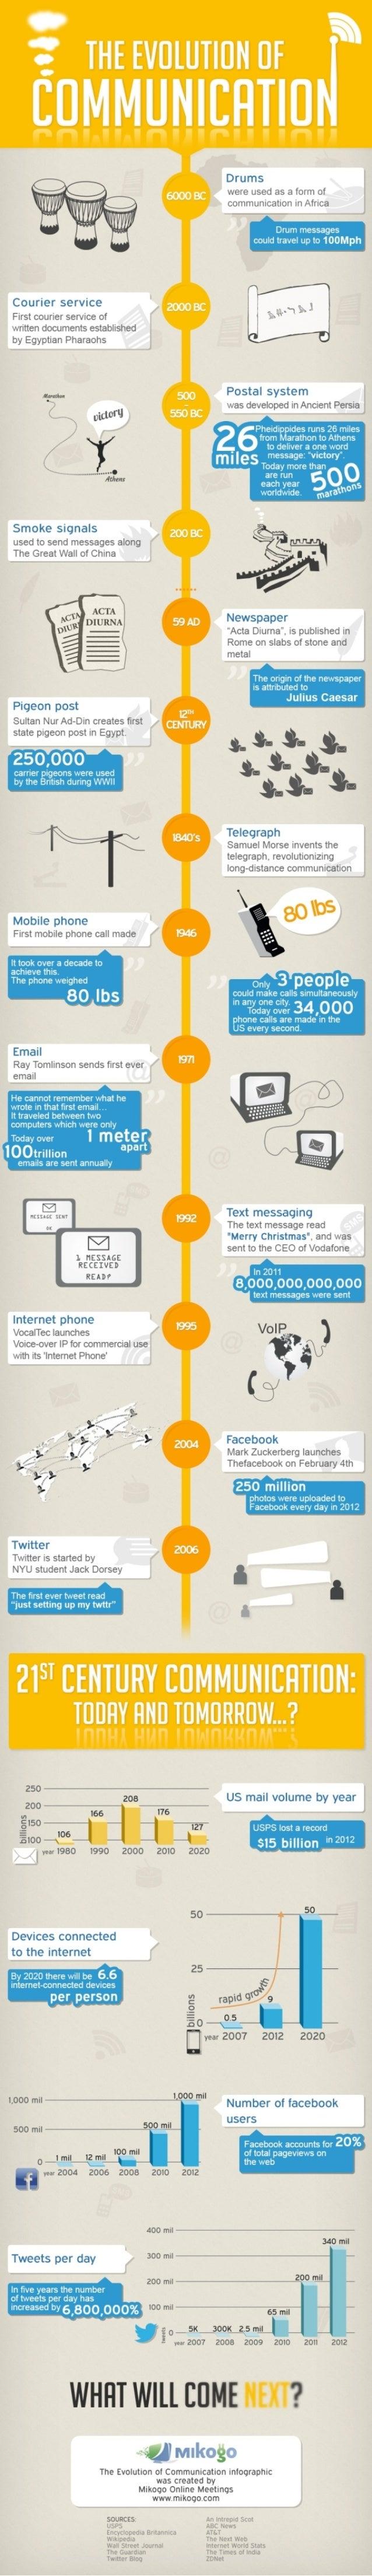 Evolution of-communication-infographic